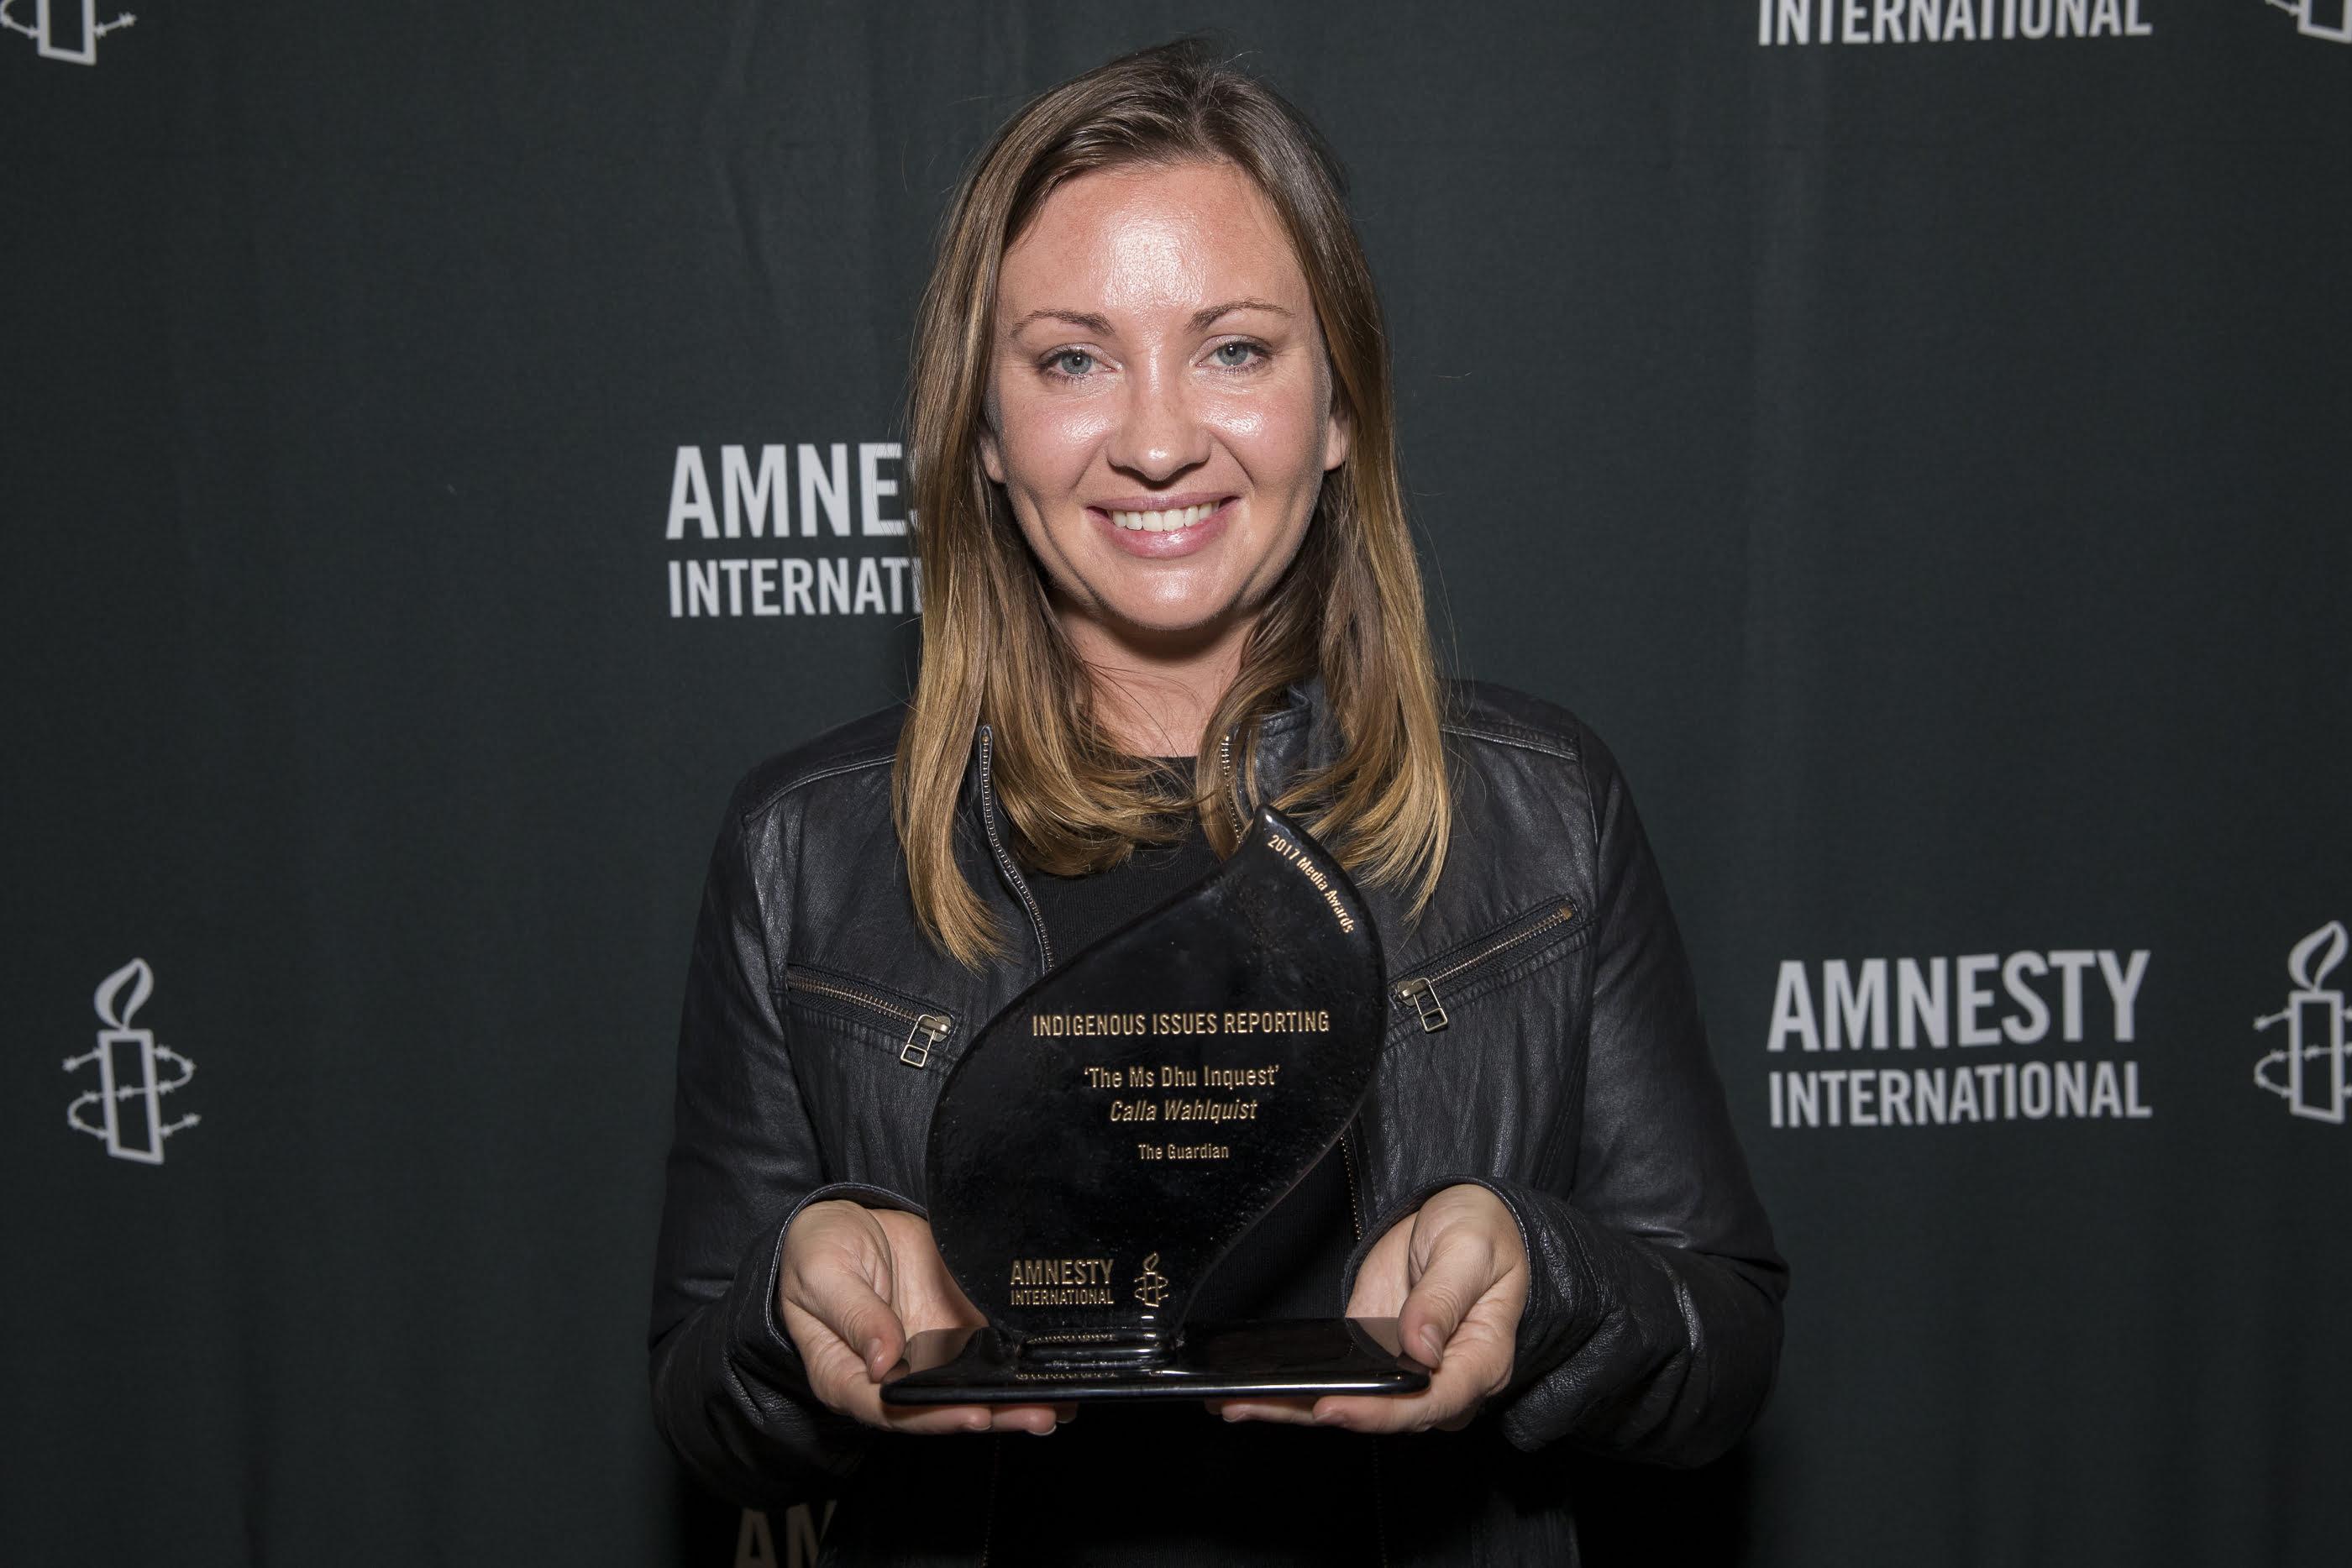 Helen Davison collects a 2017 Amnesty International Media Award on behalf of Calla Wahlquist. © Joseph Mayers Photography